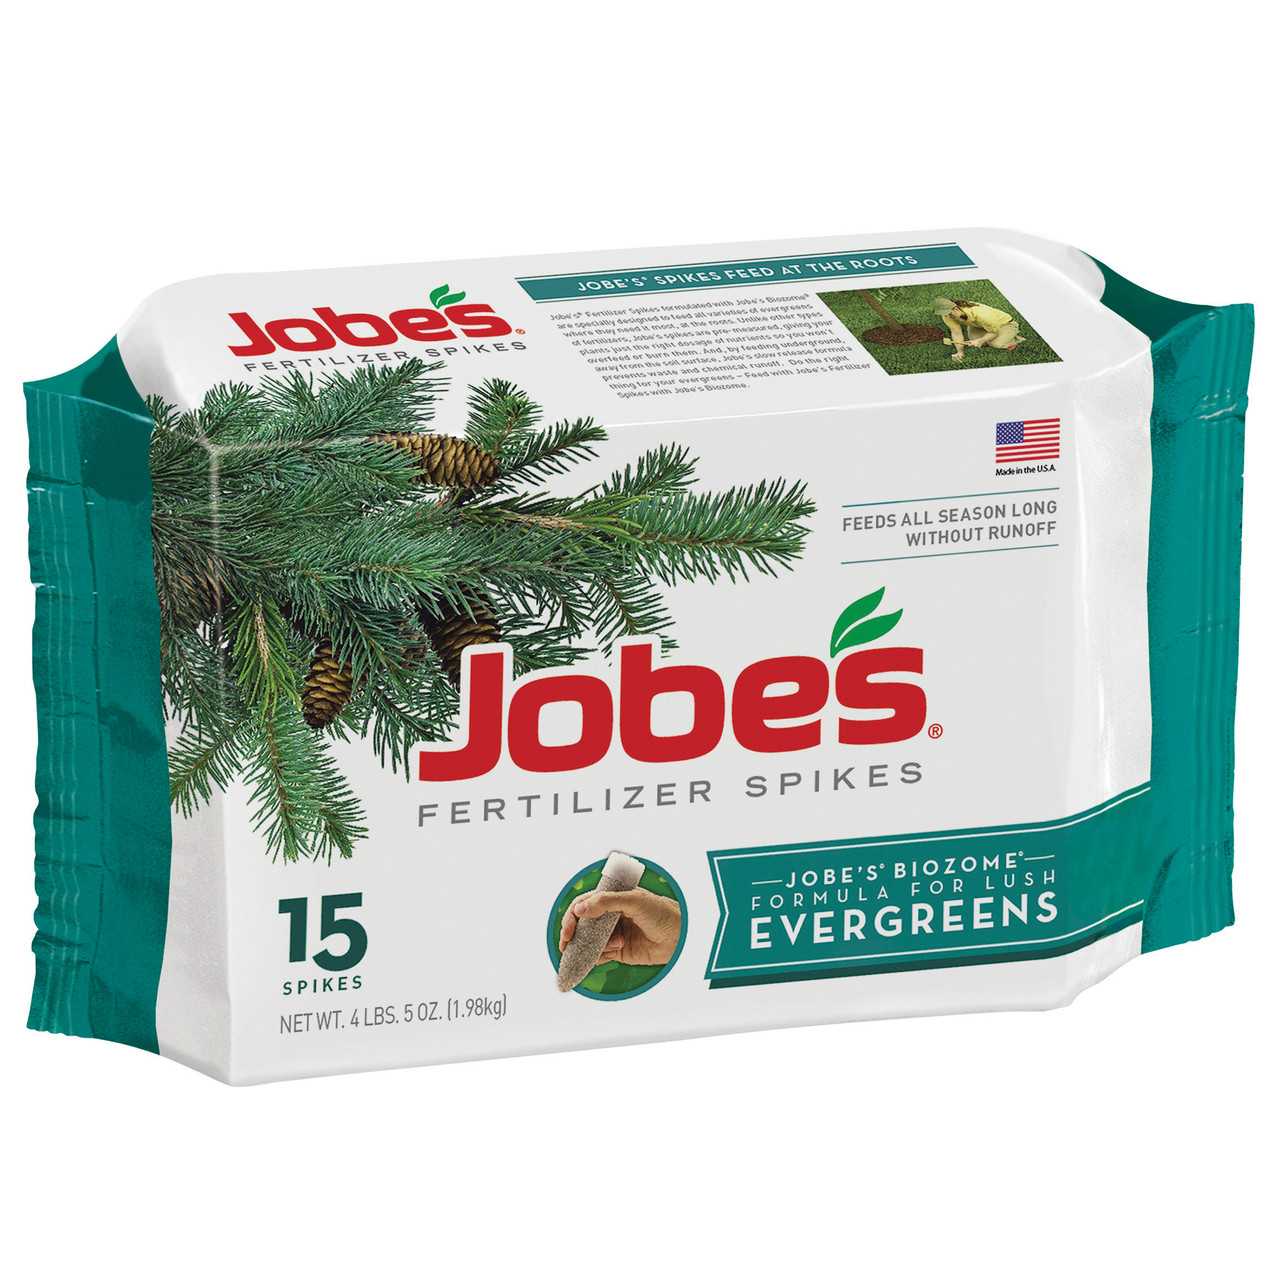 Jobe's-Evergreen-Tree-&-Shrub-Fertilizer-Spikes,-15-count